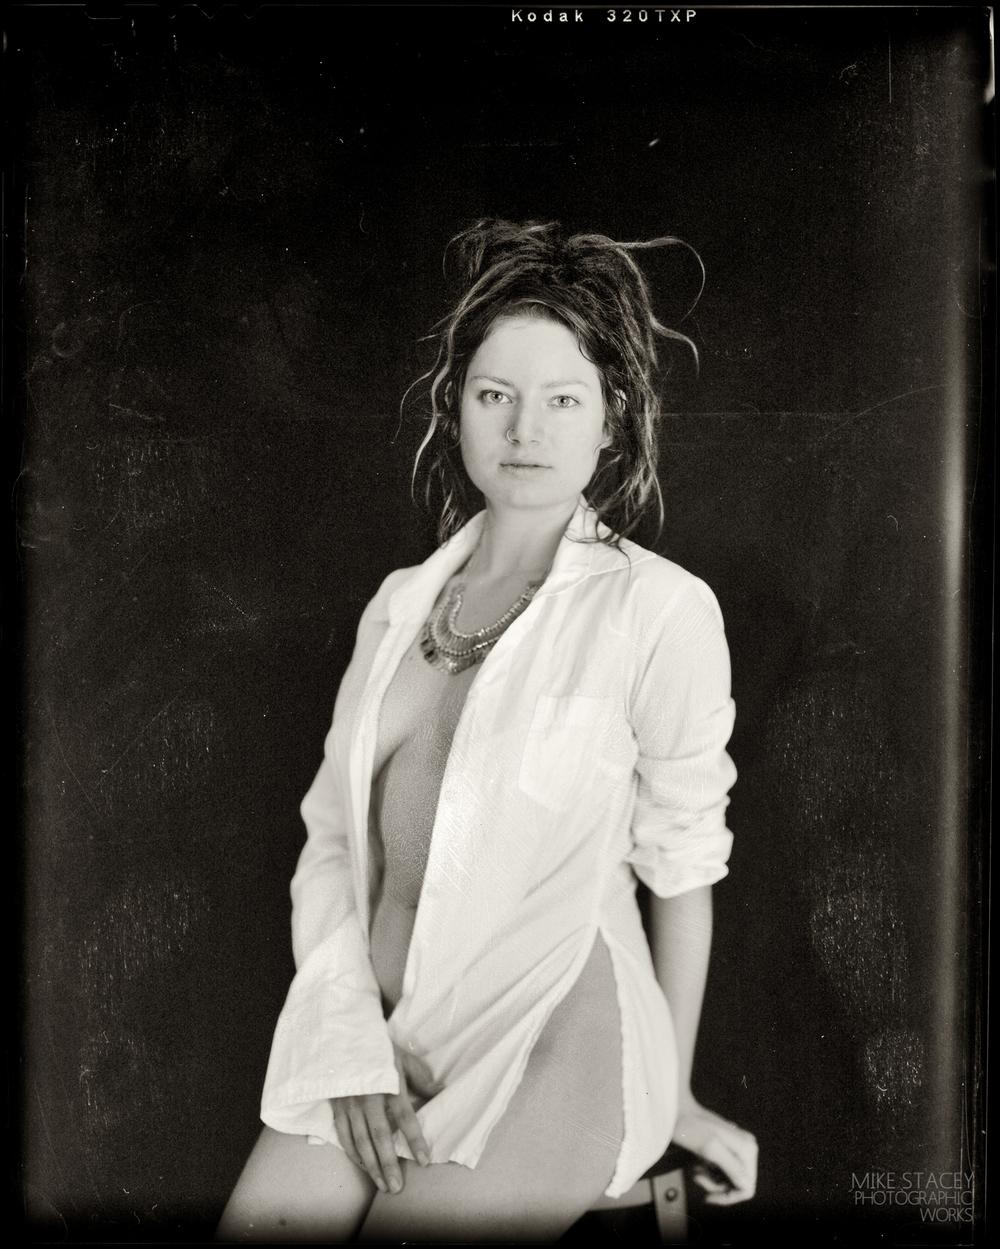 Bianca Wolff. September 2015. On 4x5 Kodak.